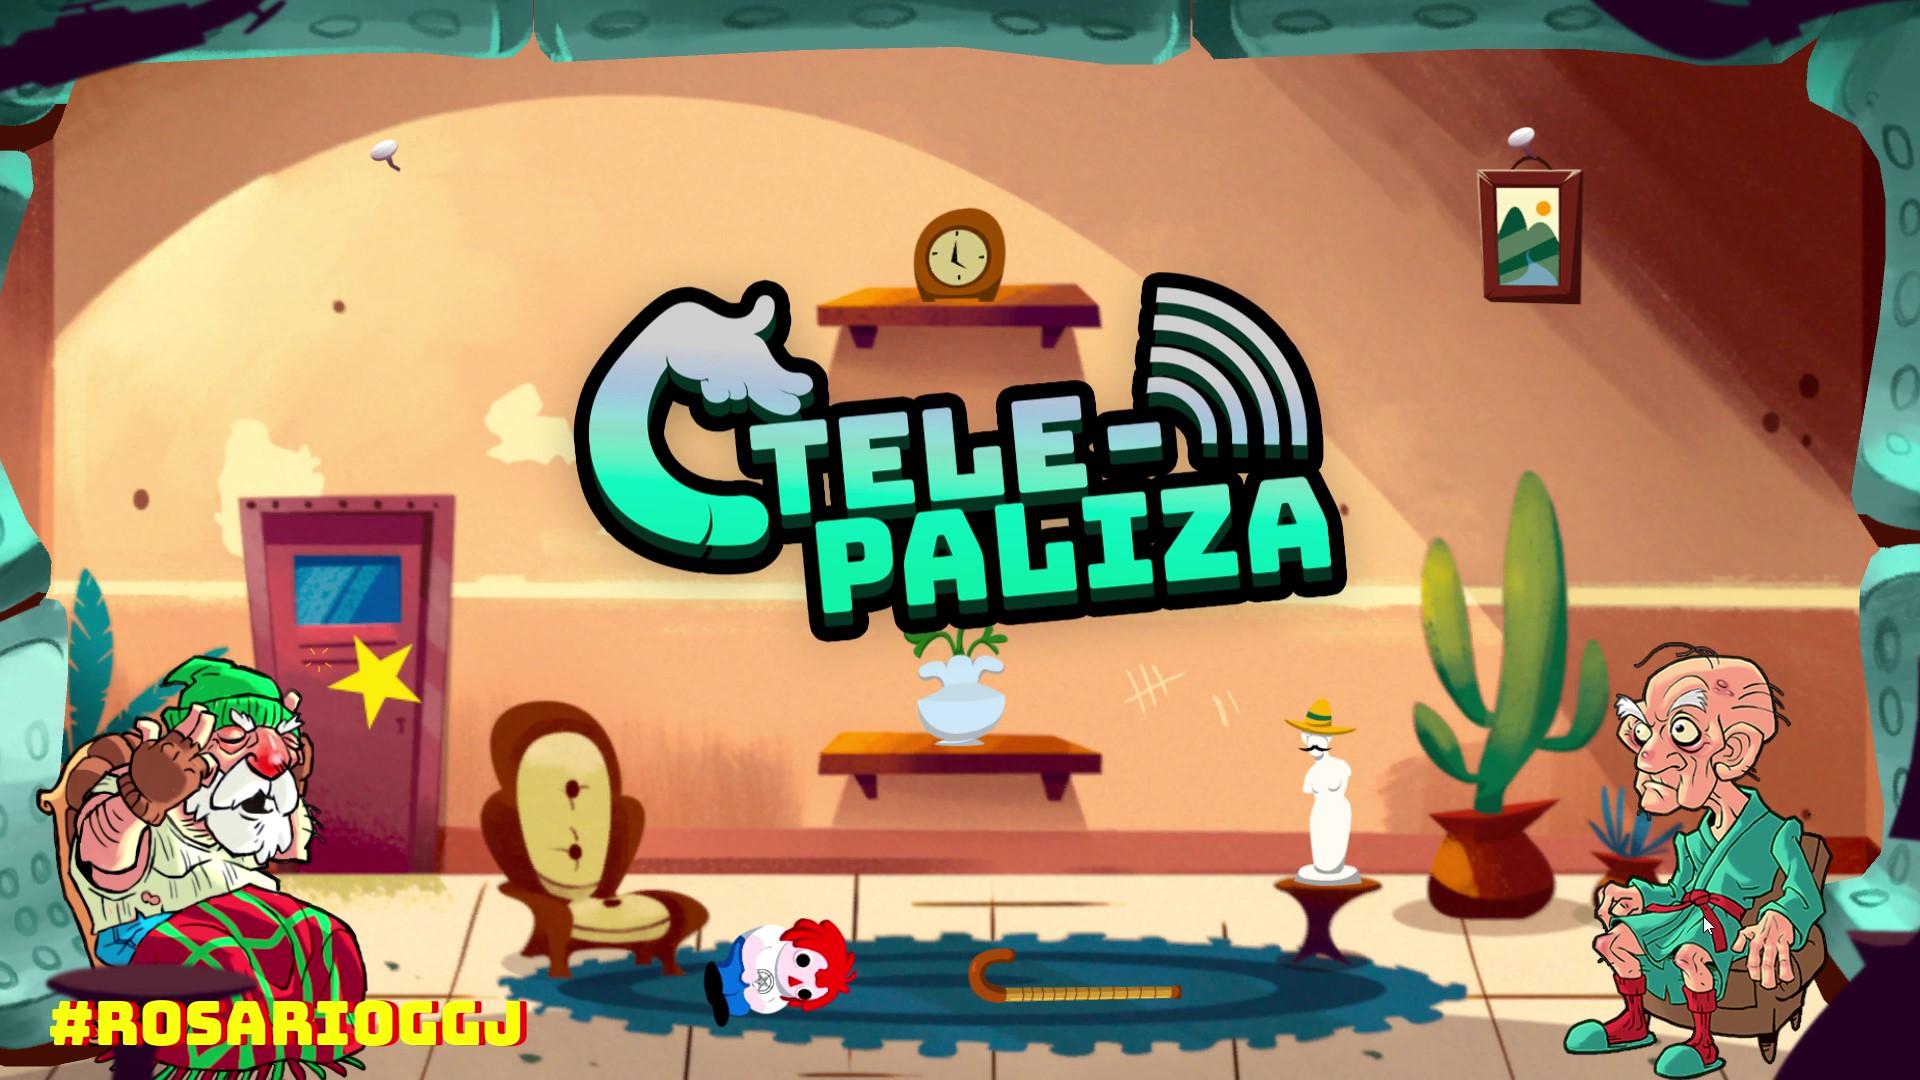 TelePaliza